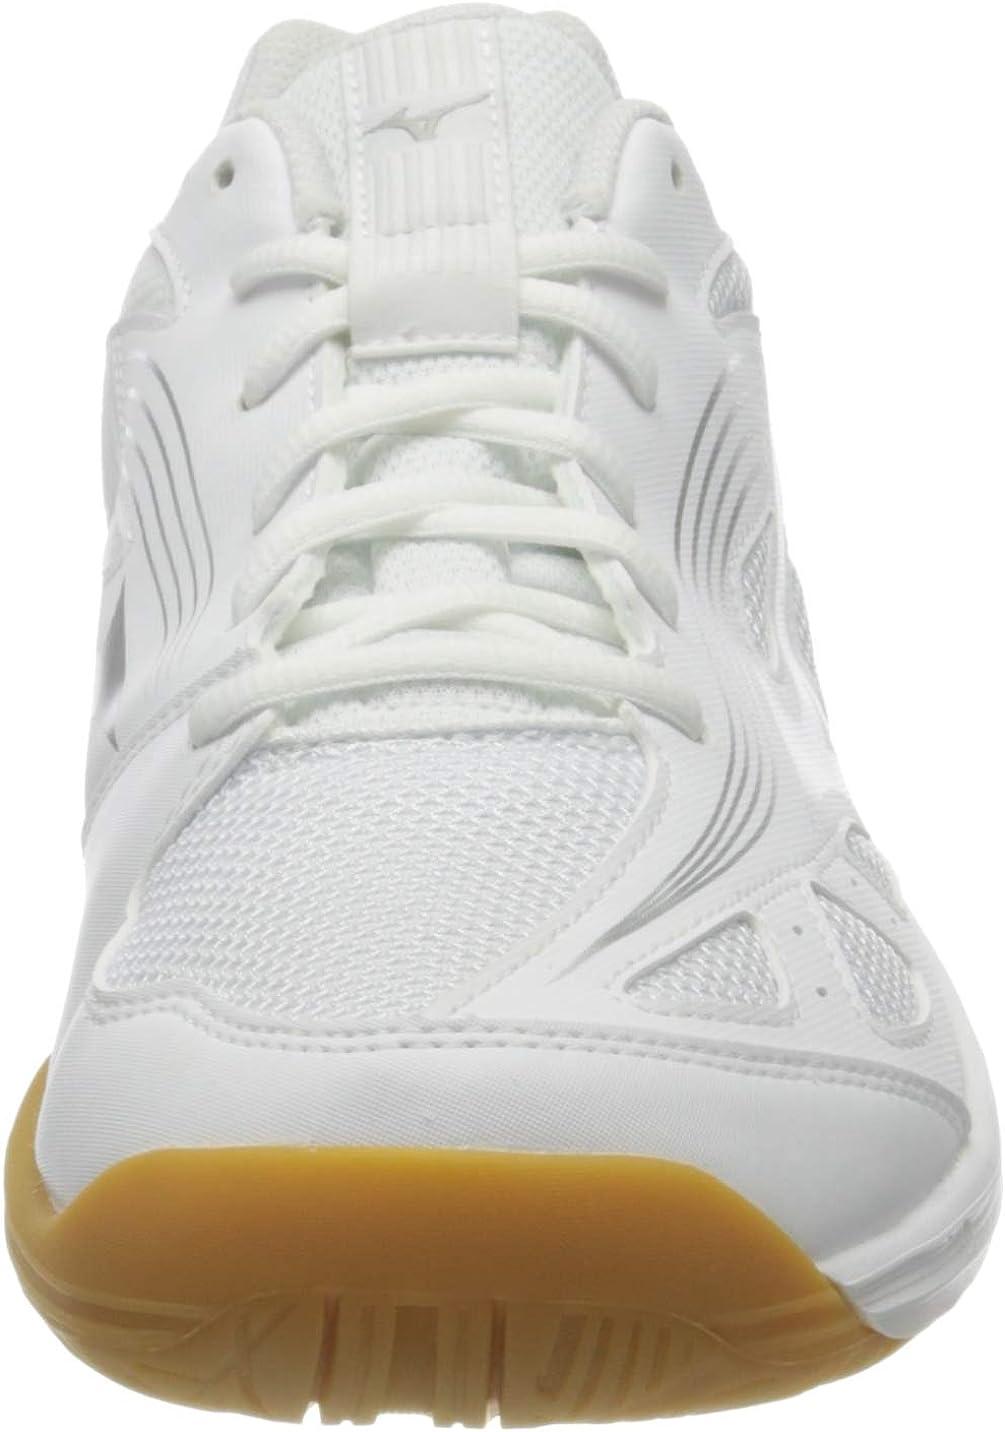 Mizuno Womens Running Volleyball Shoe White Silver 8 us